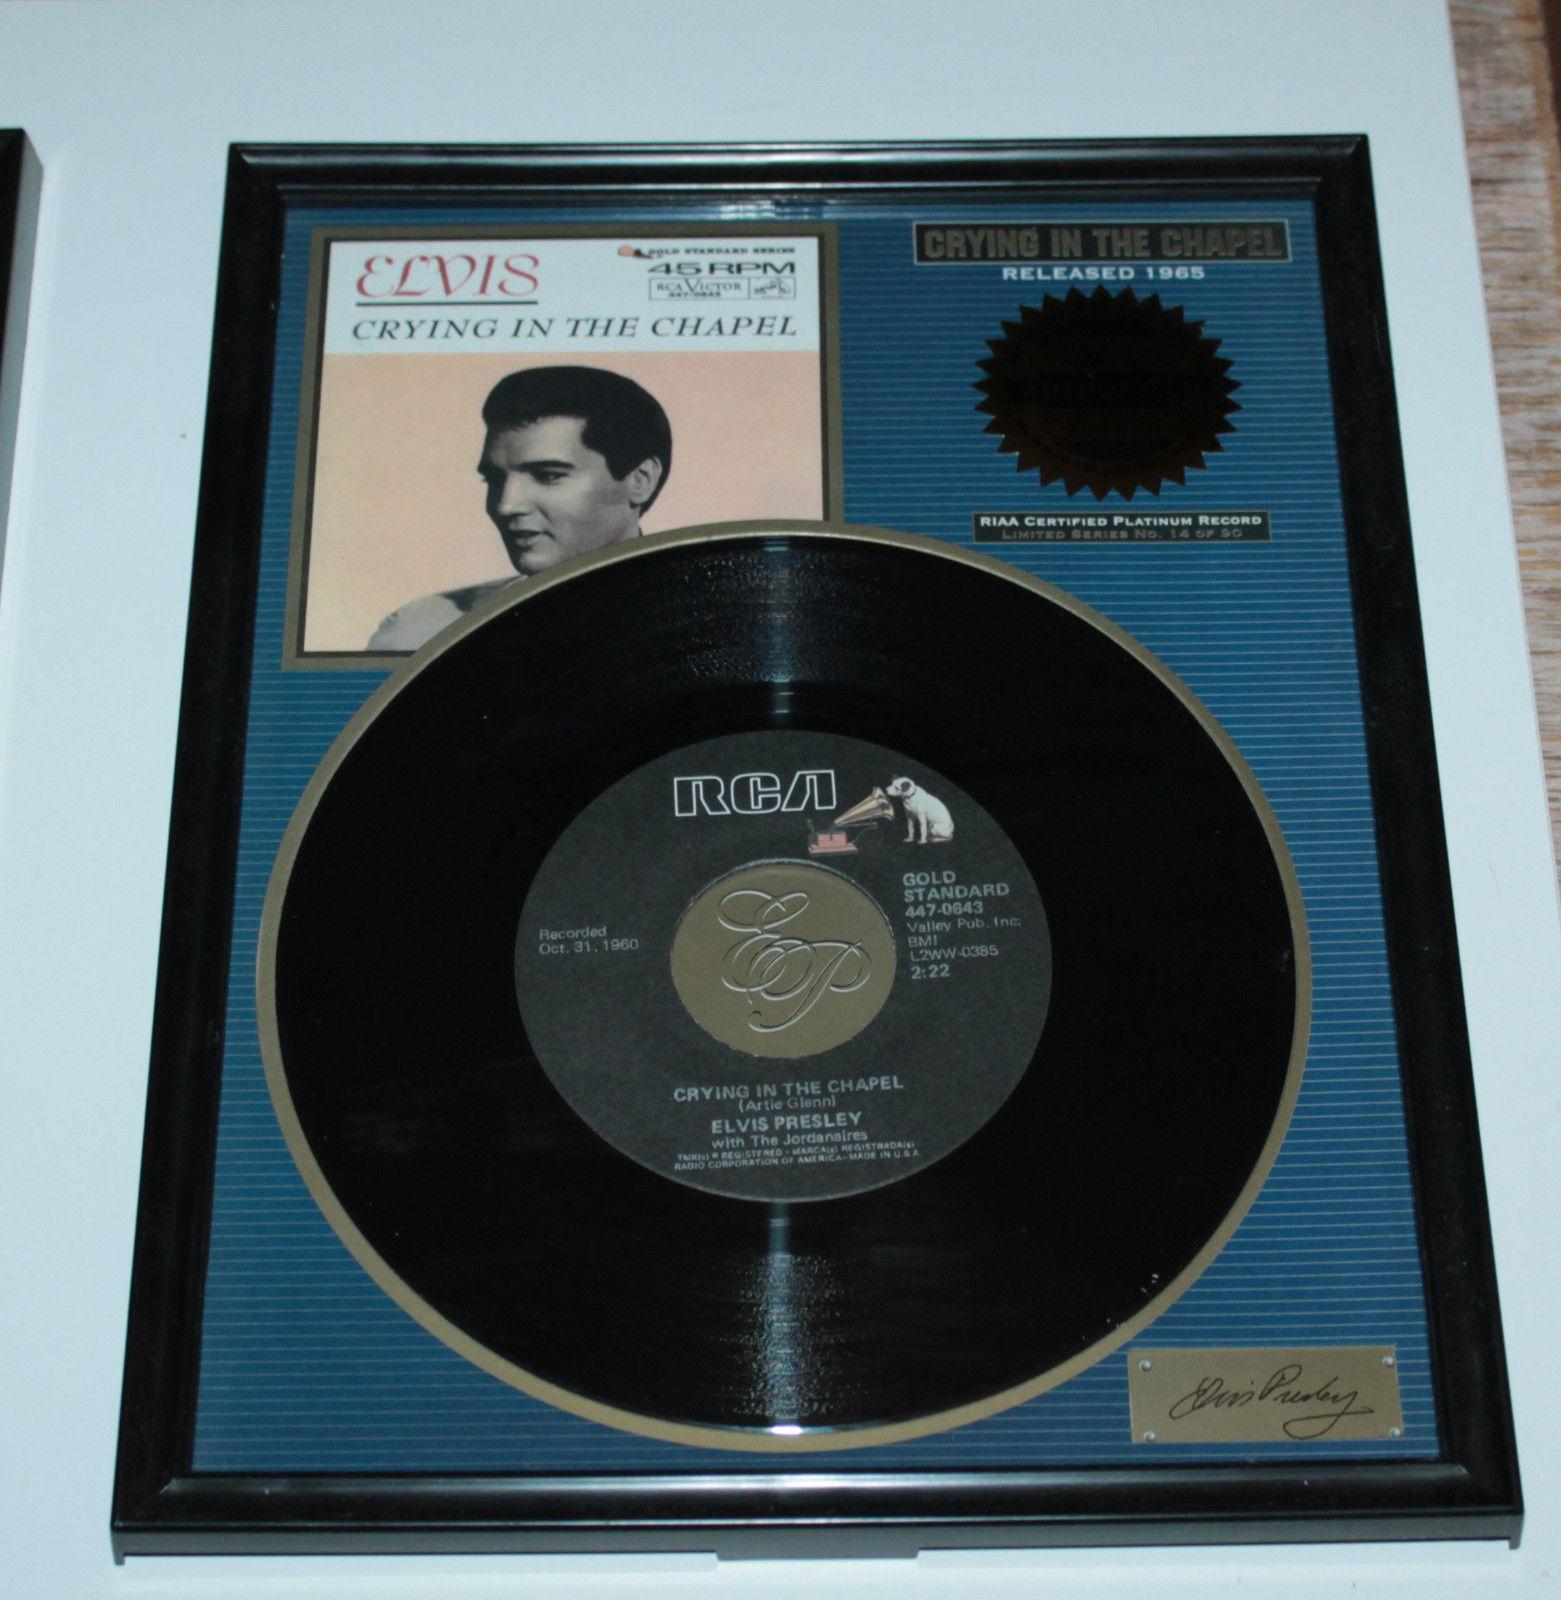 Elvis Presley - Crying In The Chapel, RIAA Certified Platinum Record, Vinyl